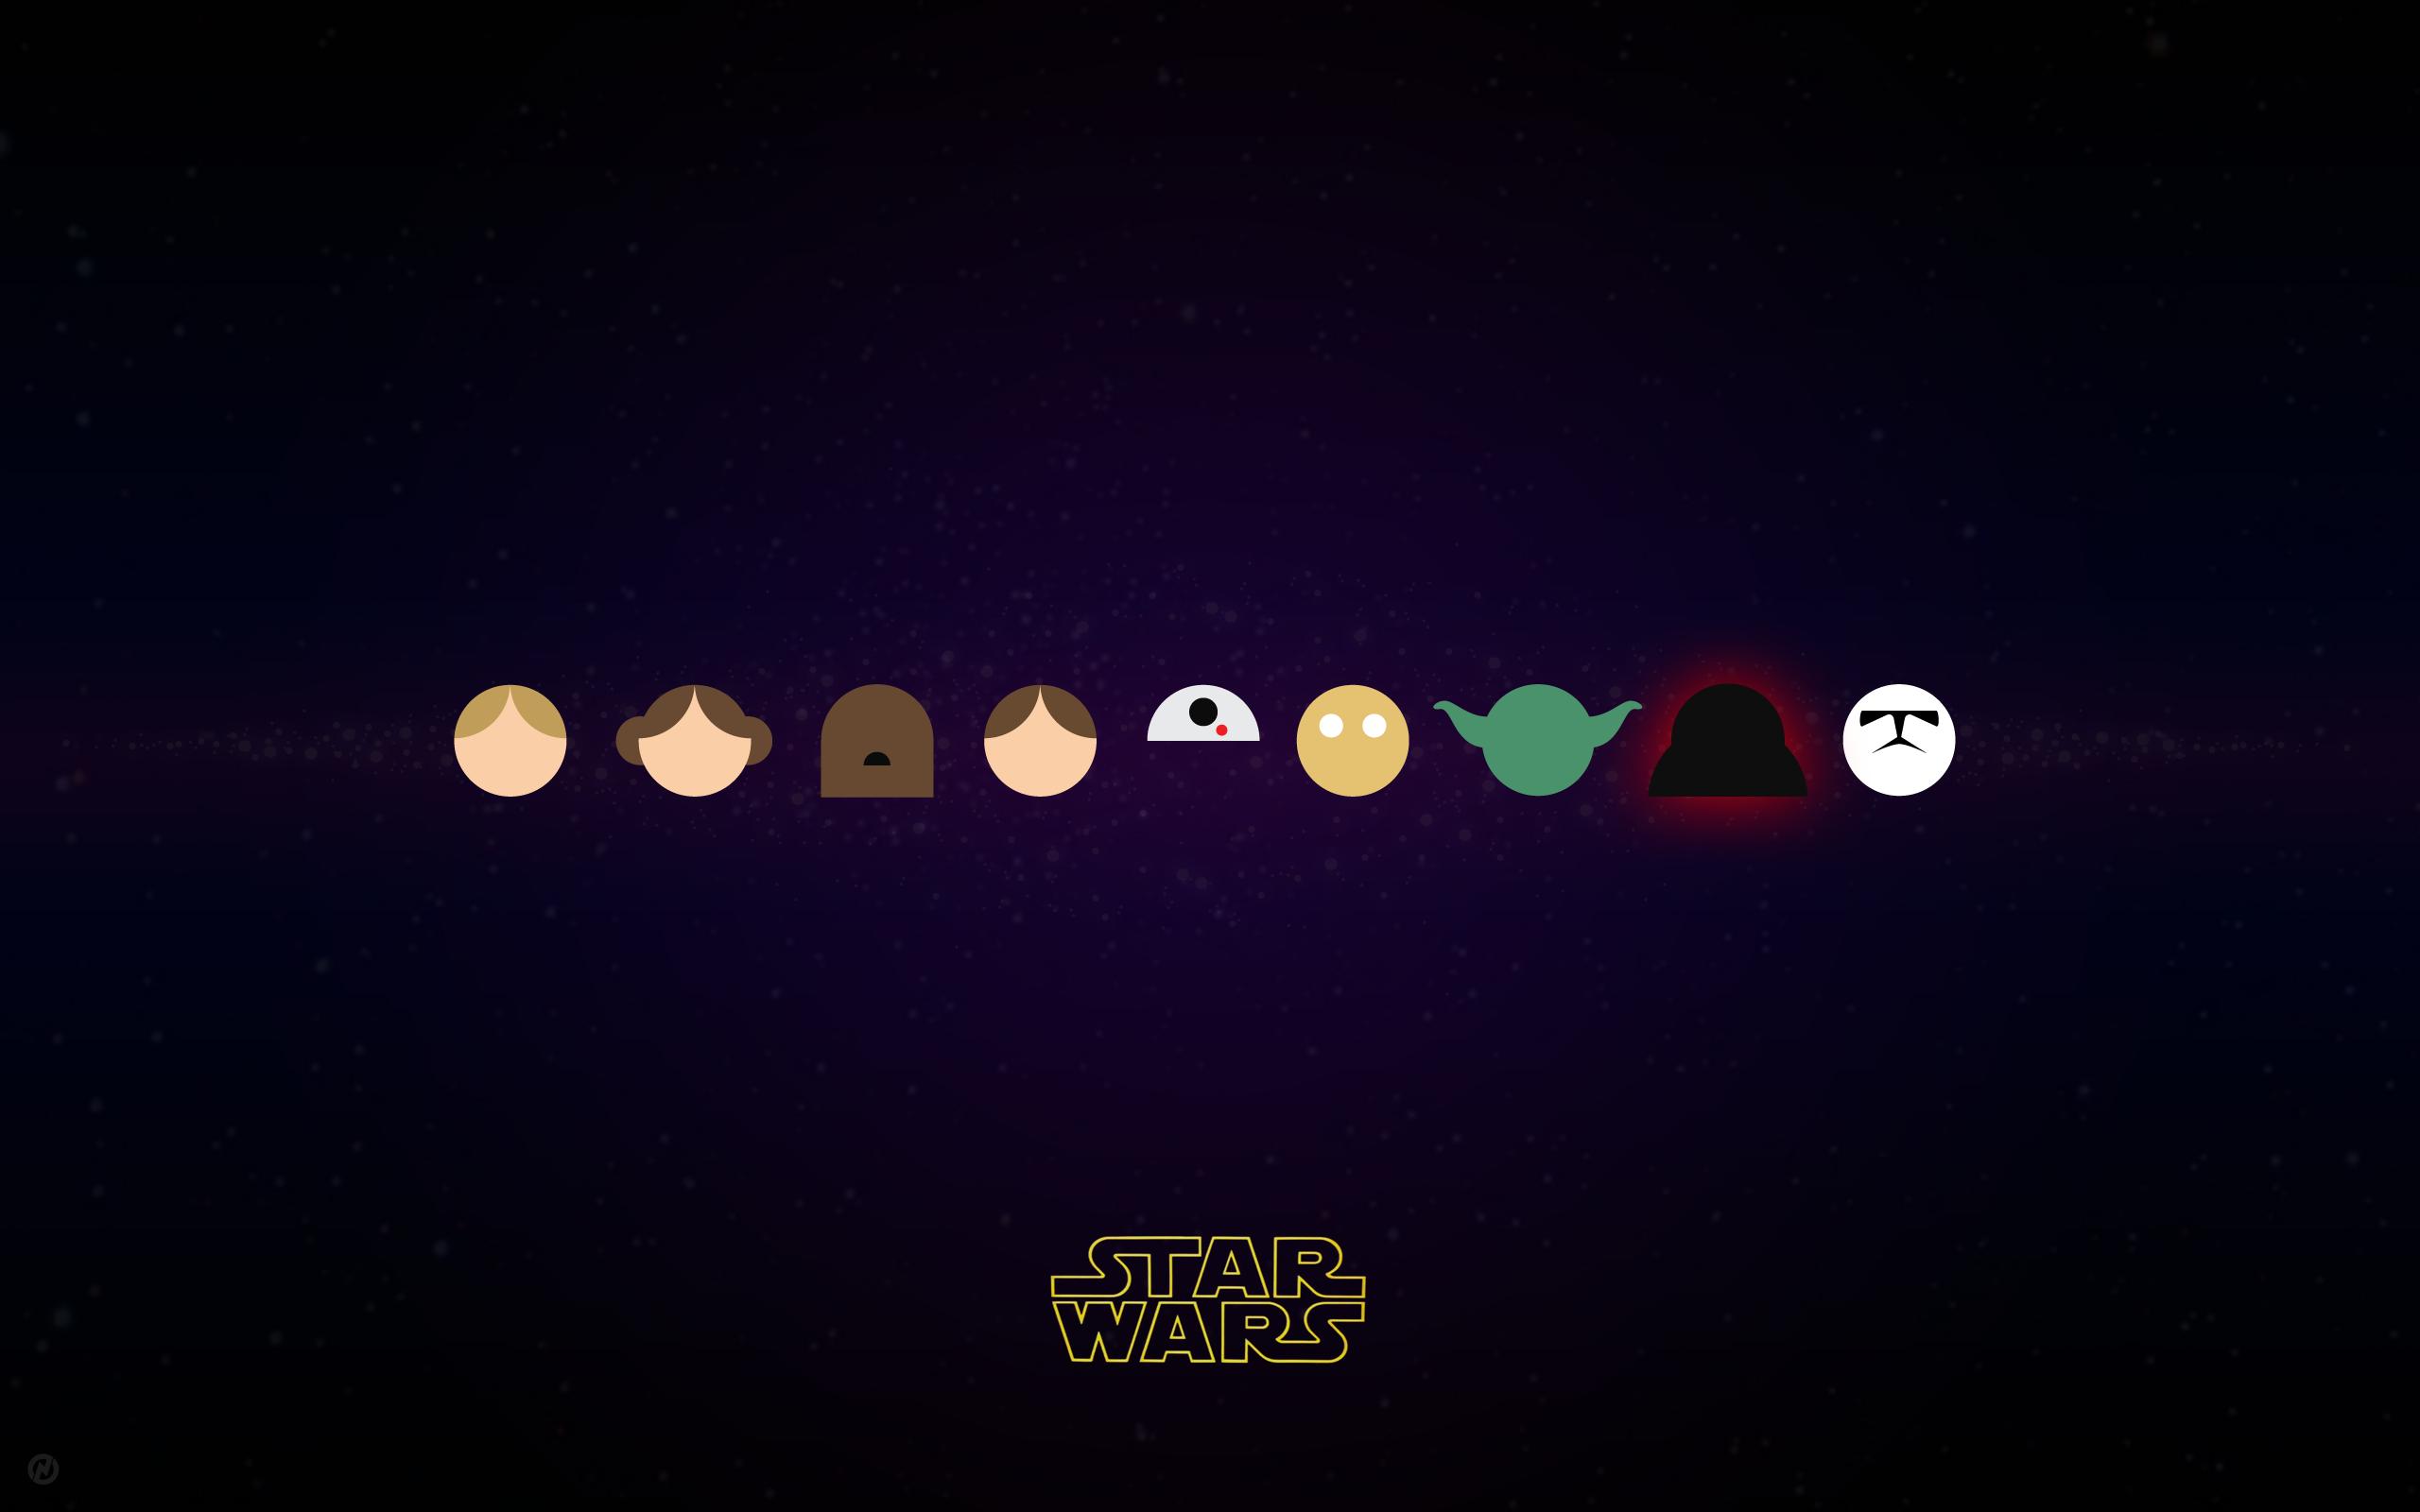 Star Wars Characters In Vector Star Wars Wallpaper Star Wars Diy Star Wars Illustration